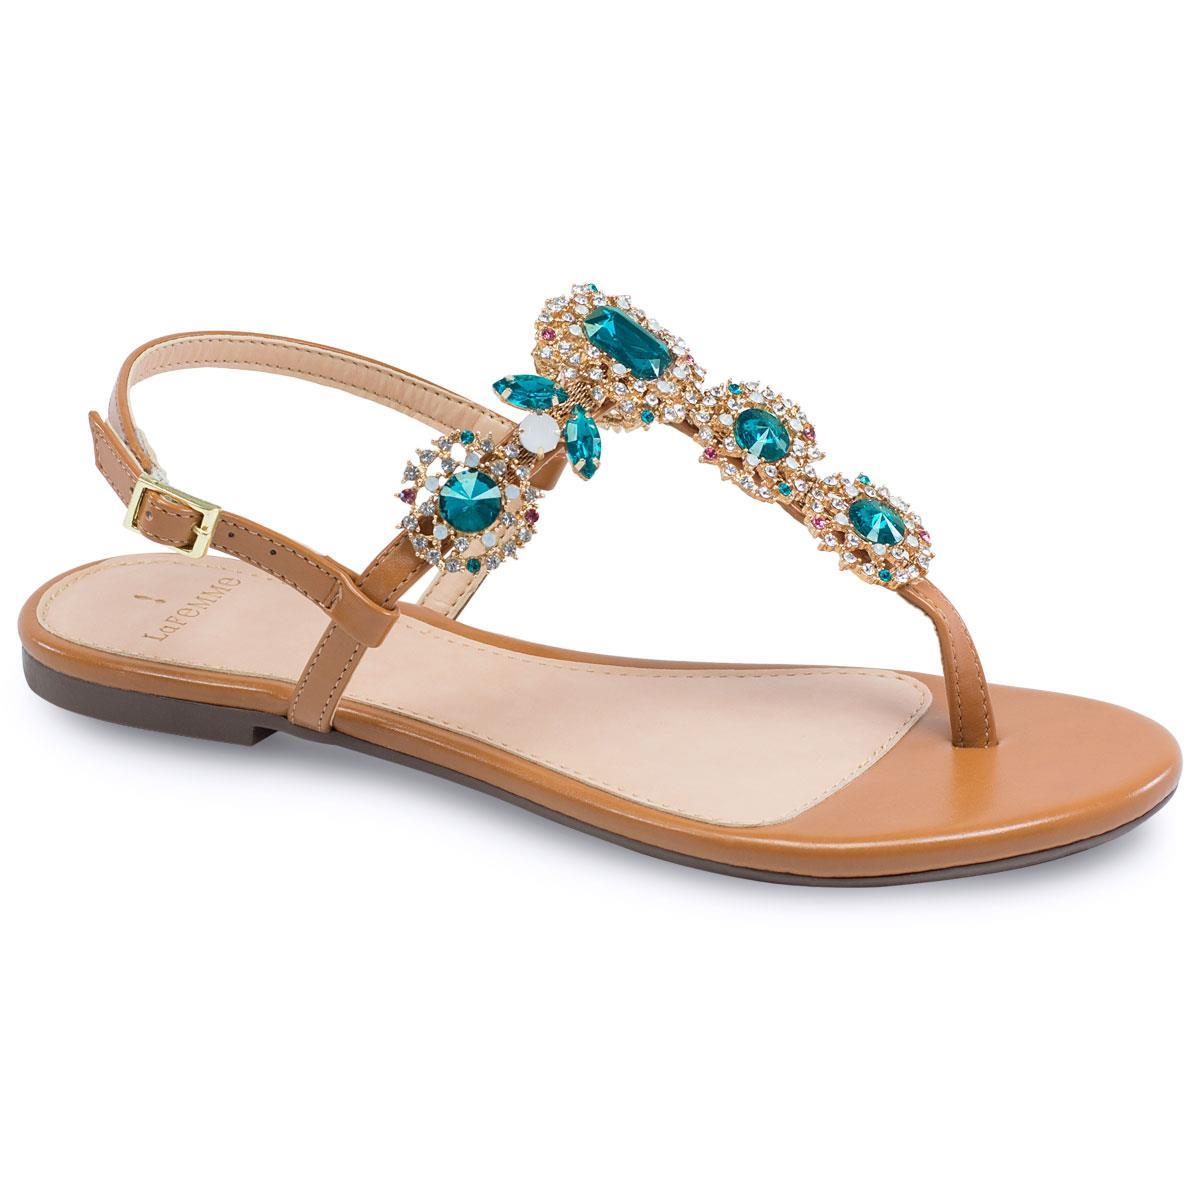 d36e82a03 Sandália Flat La Femme Pedra Azul Caramelo